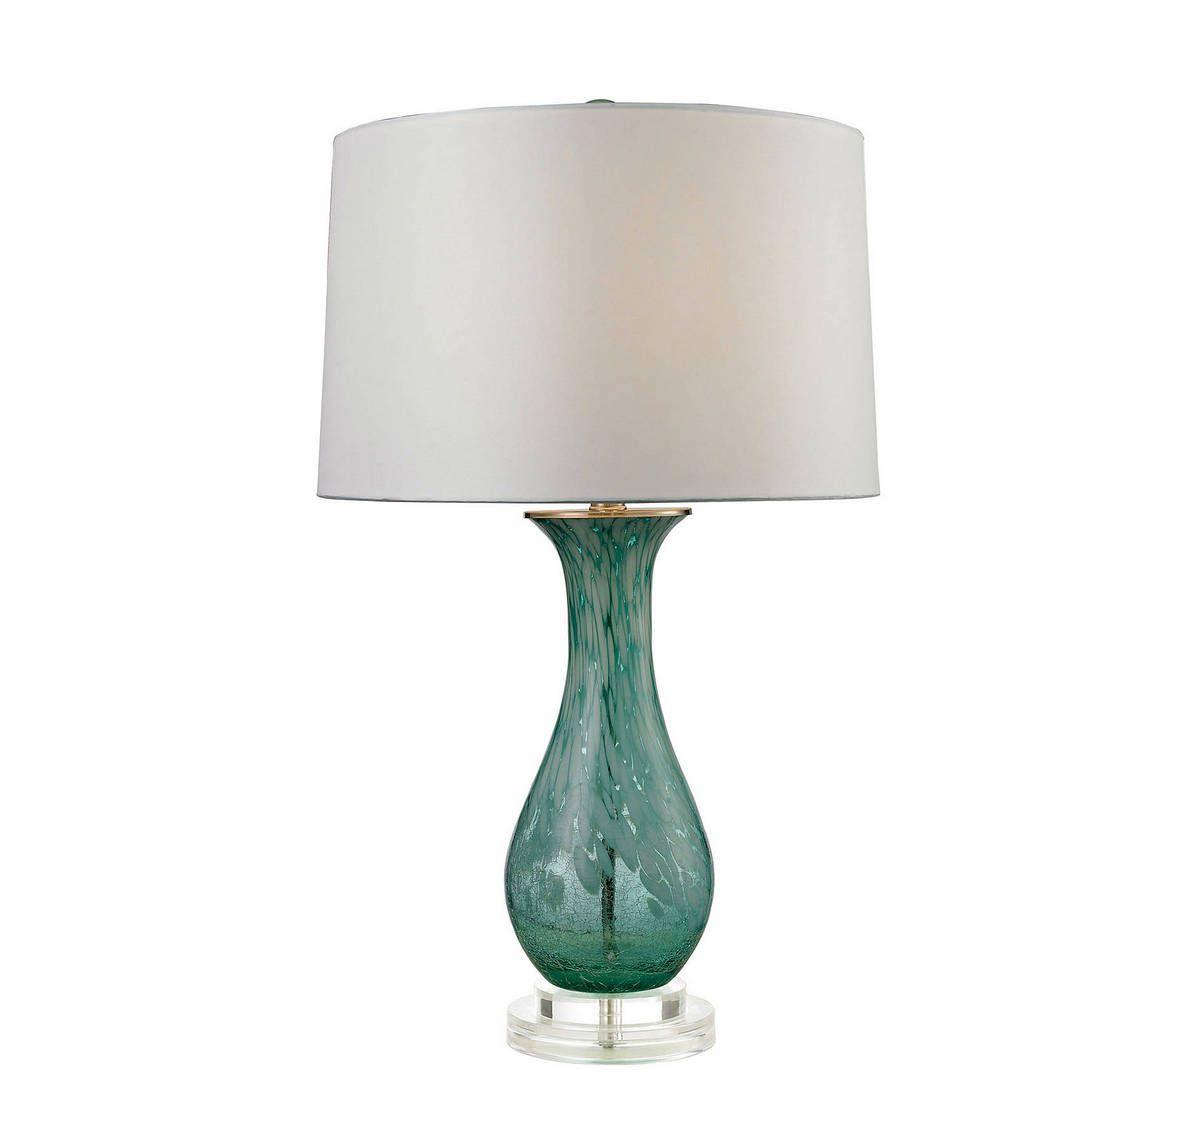 Dimond Swirl 27 Tall Glass Table Lamp In Clear Aqua Swirl Table